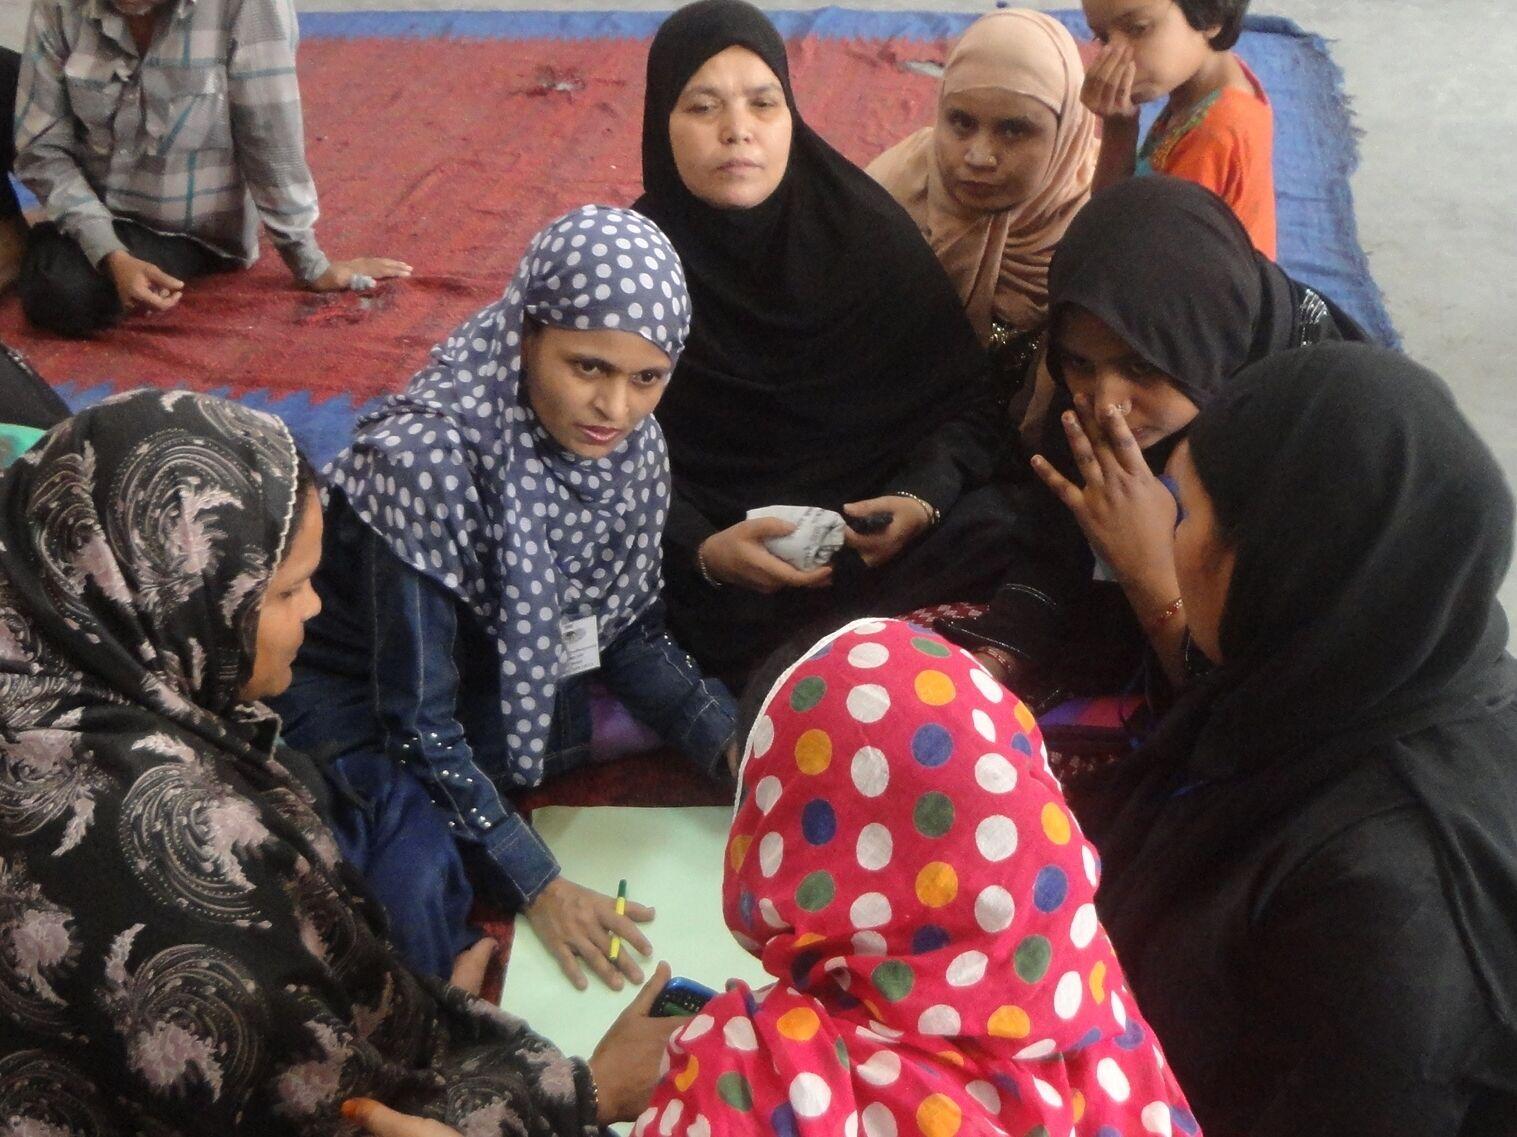 Burkha clad women discussing amongst themselves